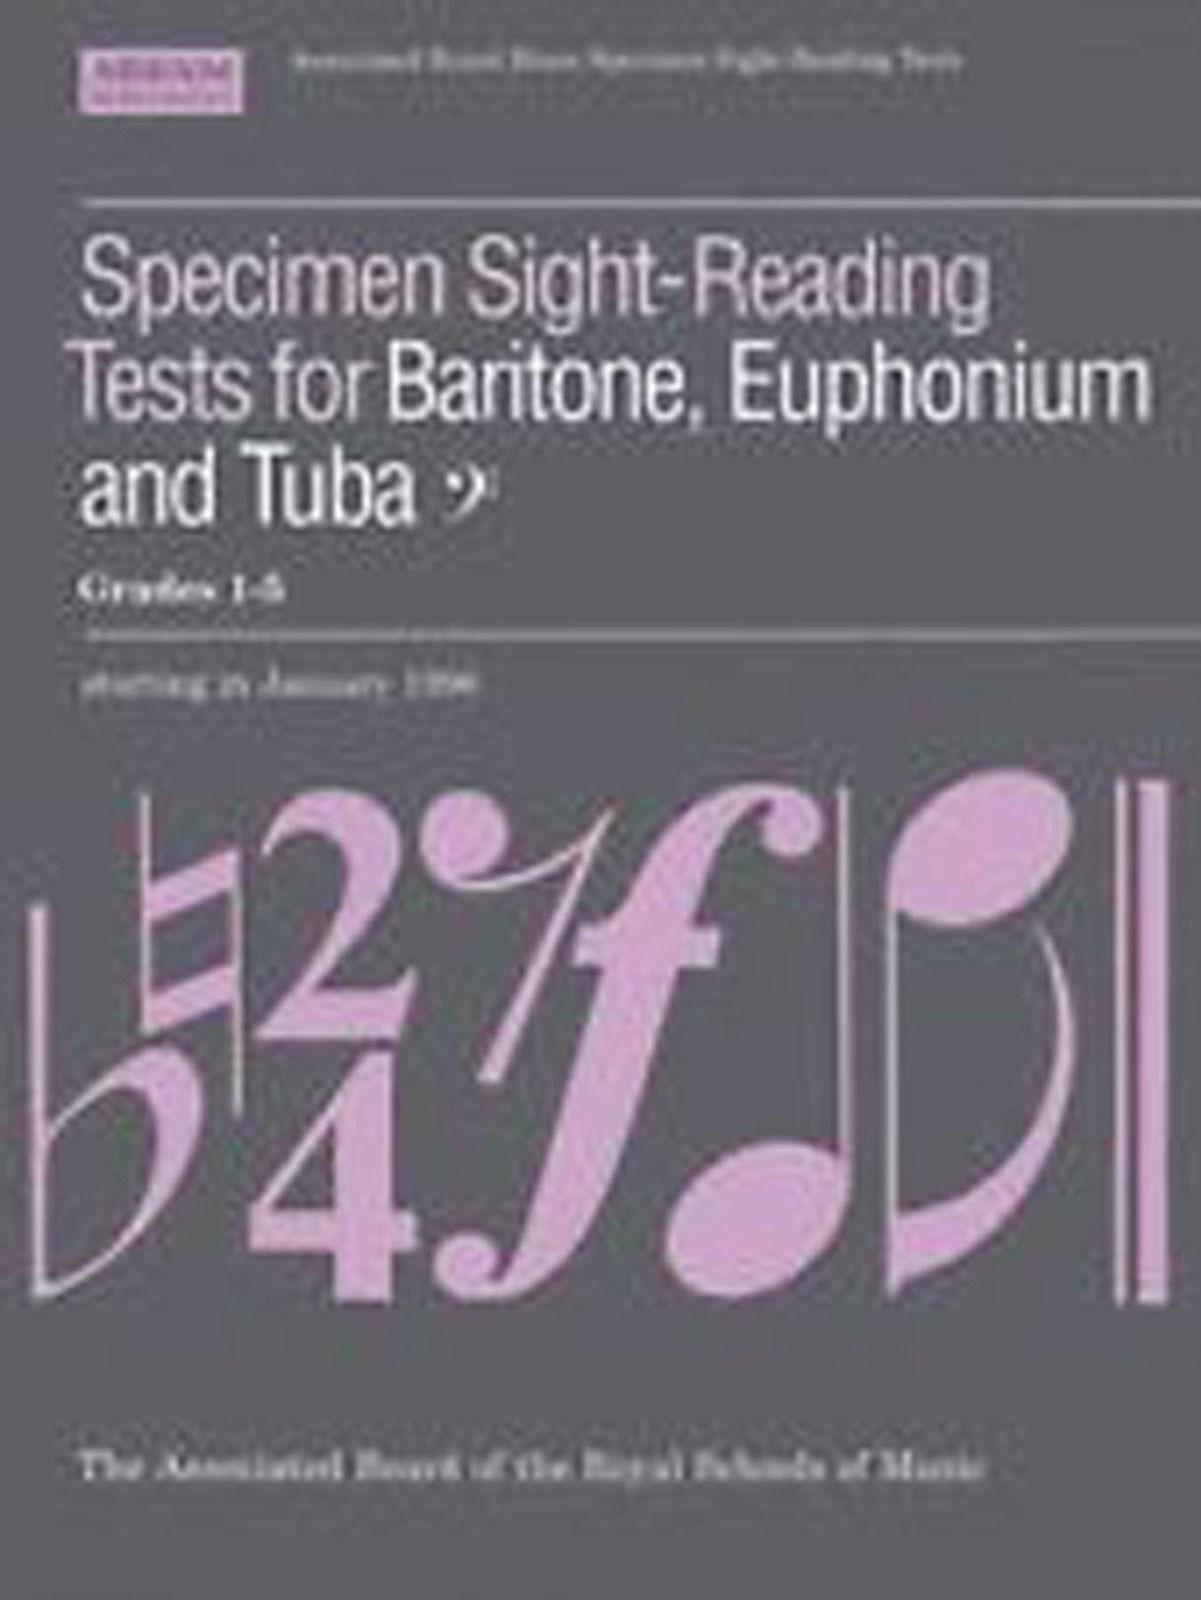 ABRSM Specimen Sight Reading Tests Baritone Euphonium Tuba Bass Clef B28